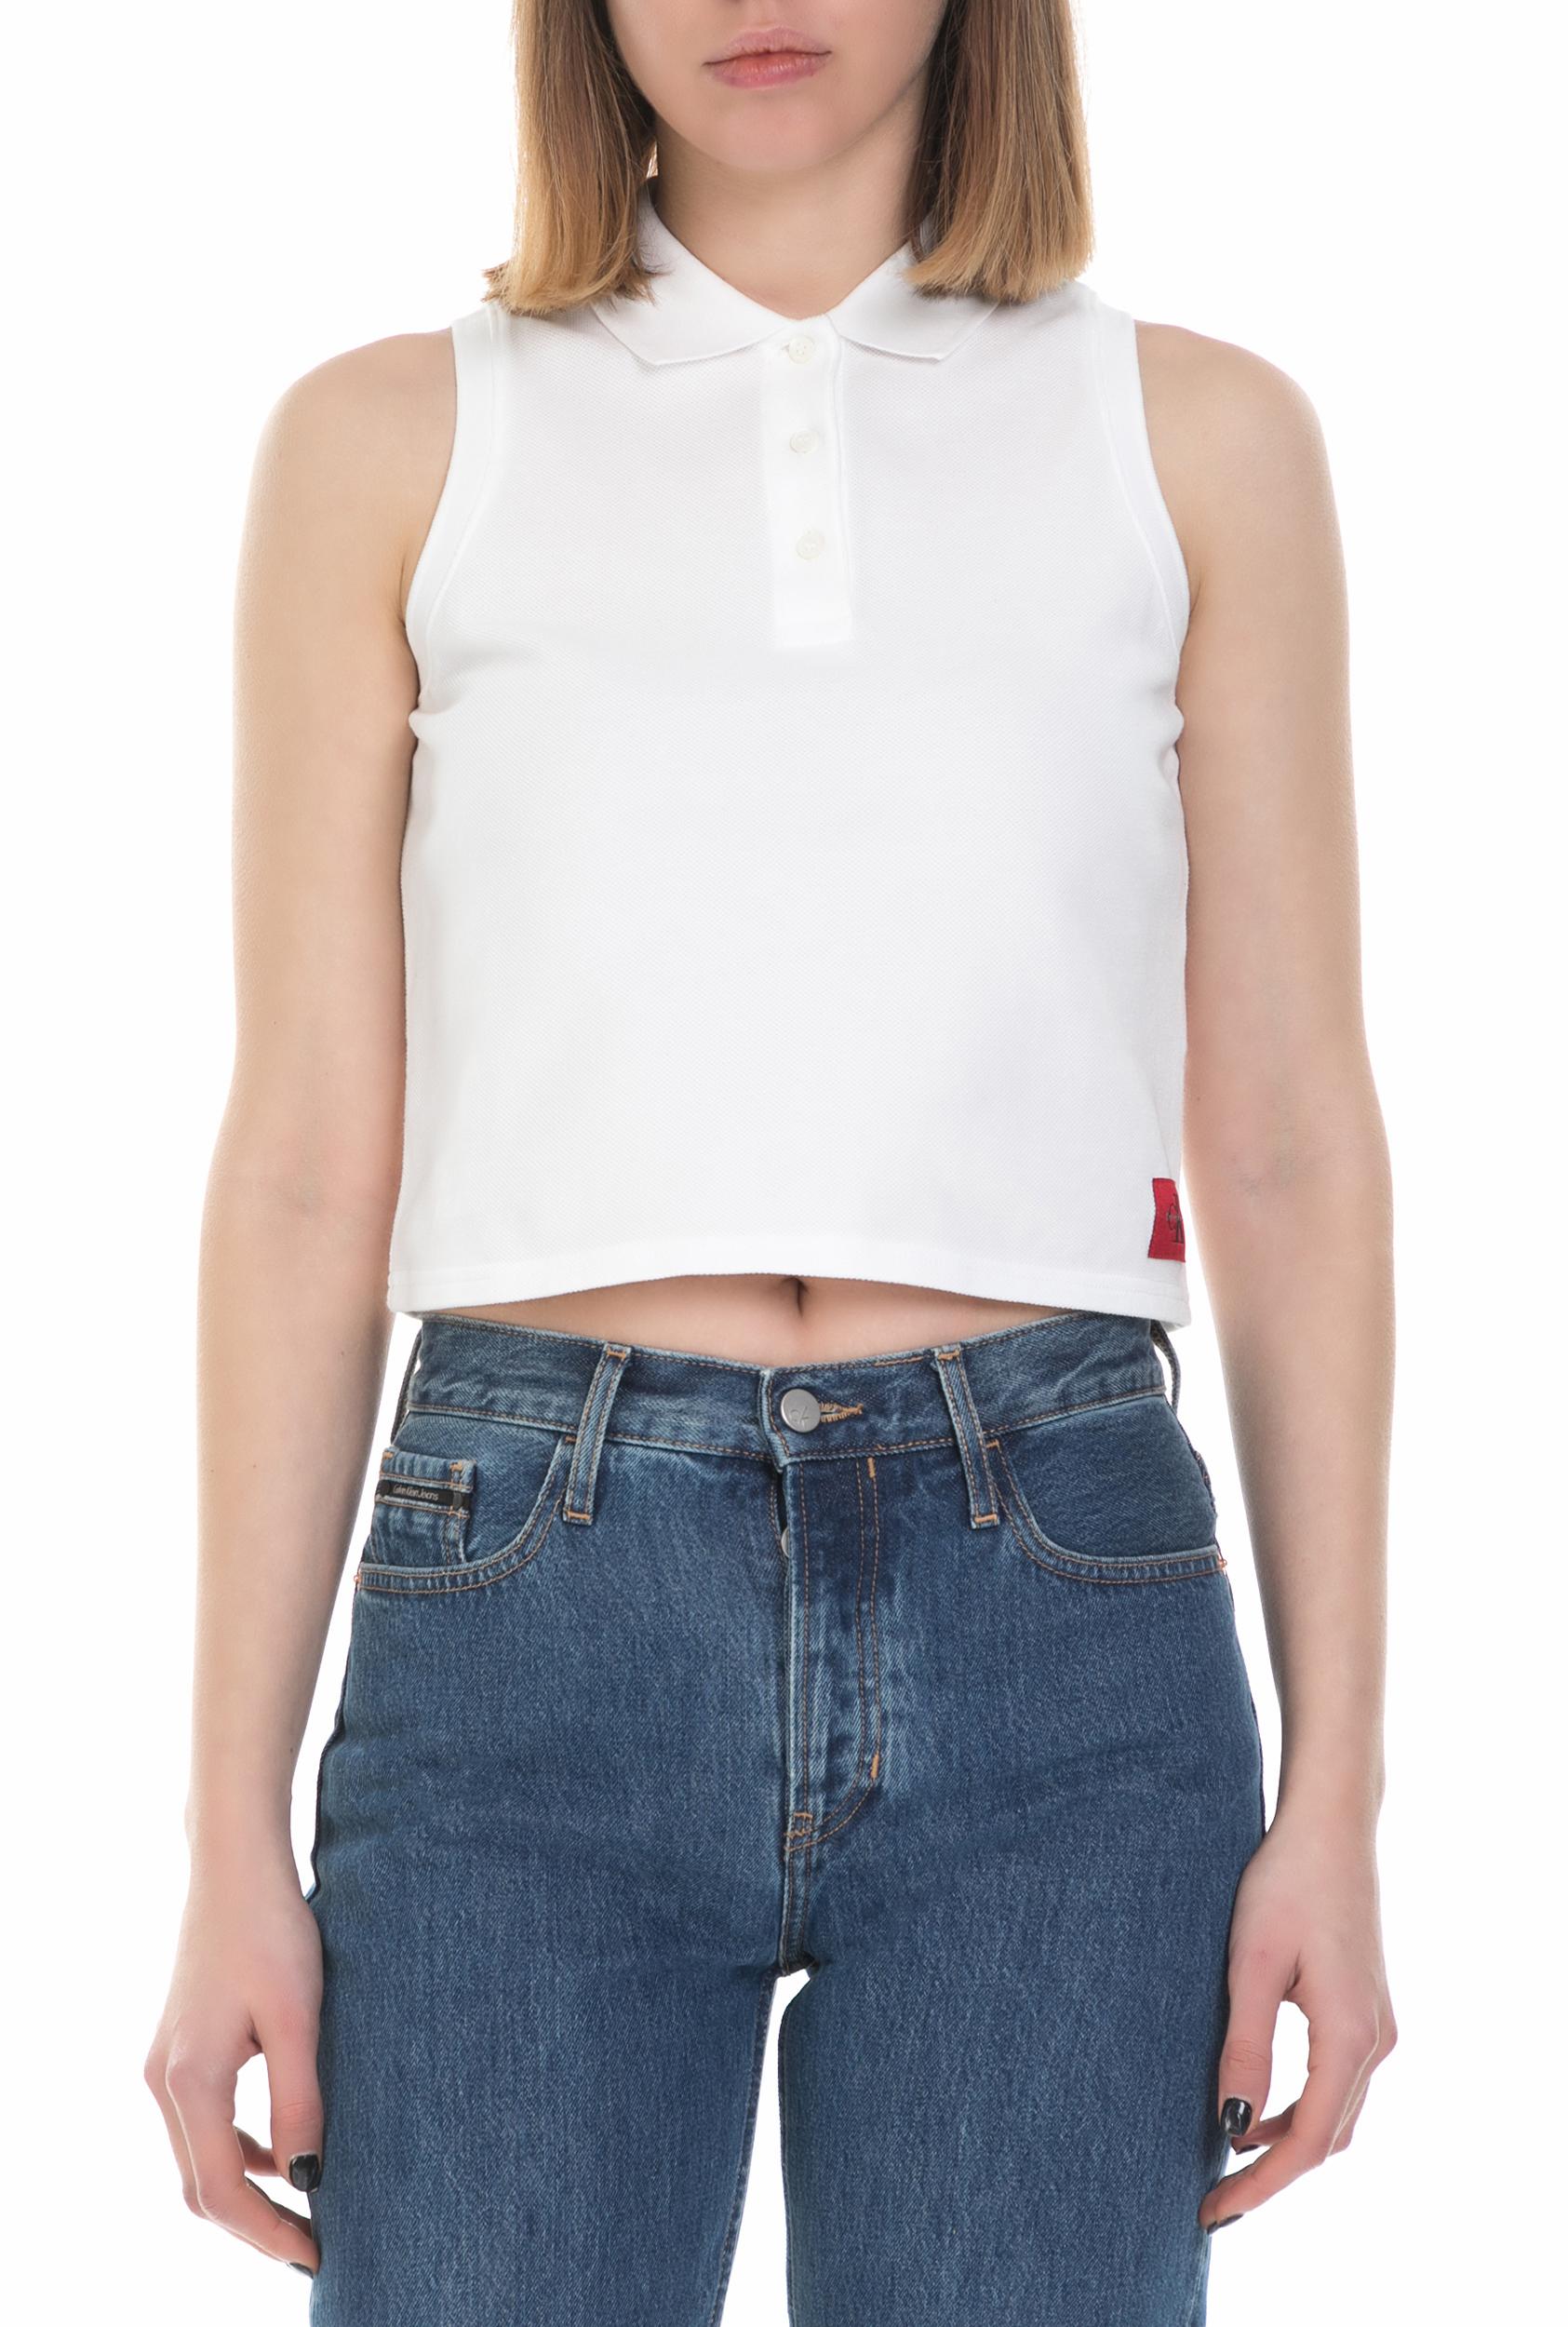 b494ae403efe CALVIN KLEIN JEANS - Γυναικεία αμάνικη polo μπλούζα Calvin Klein Jeans λευκή